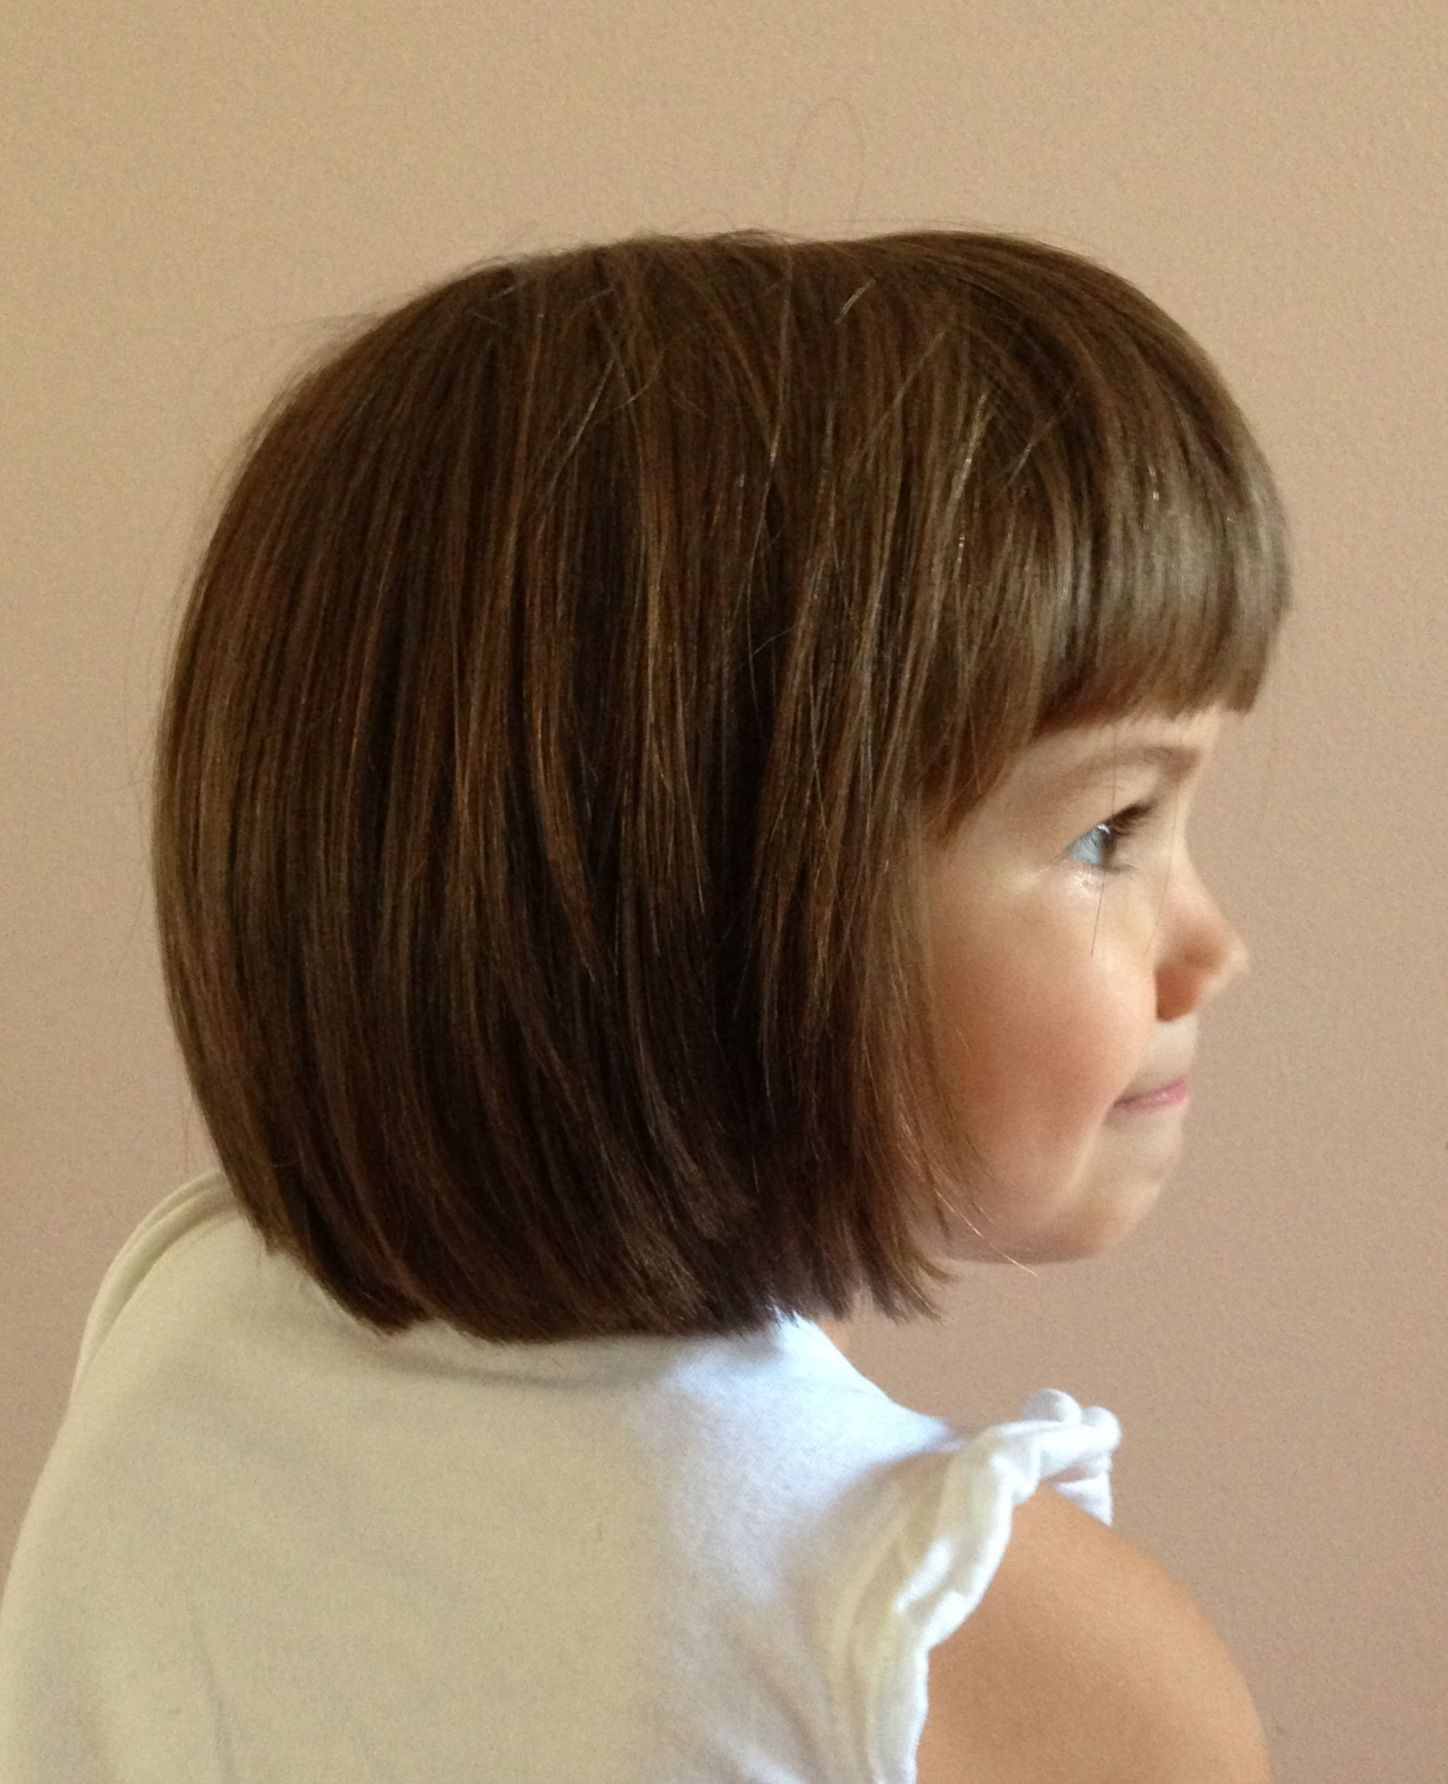 Little girl haircut bob hair cut shorter hairstyles for girls